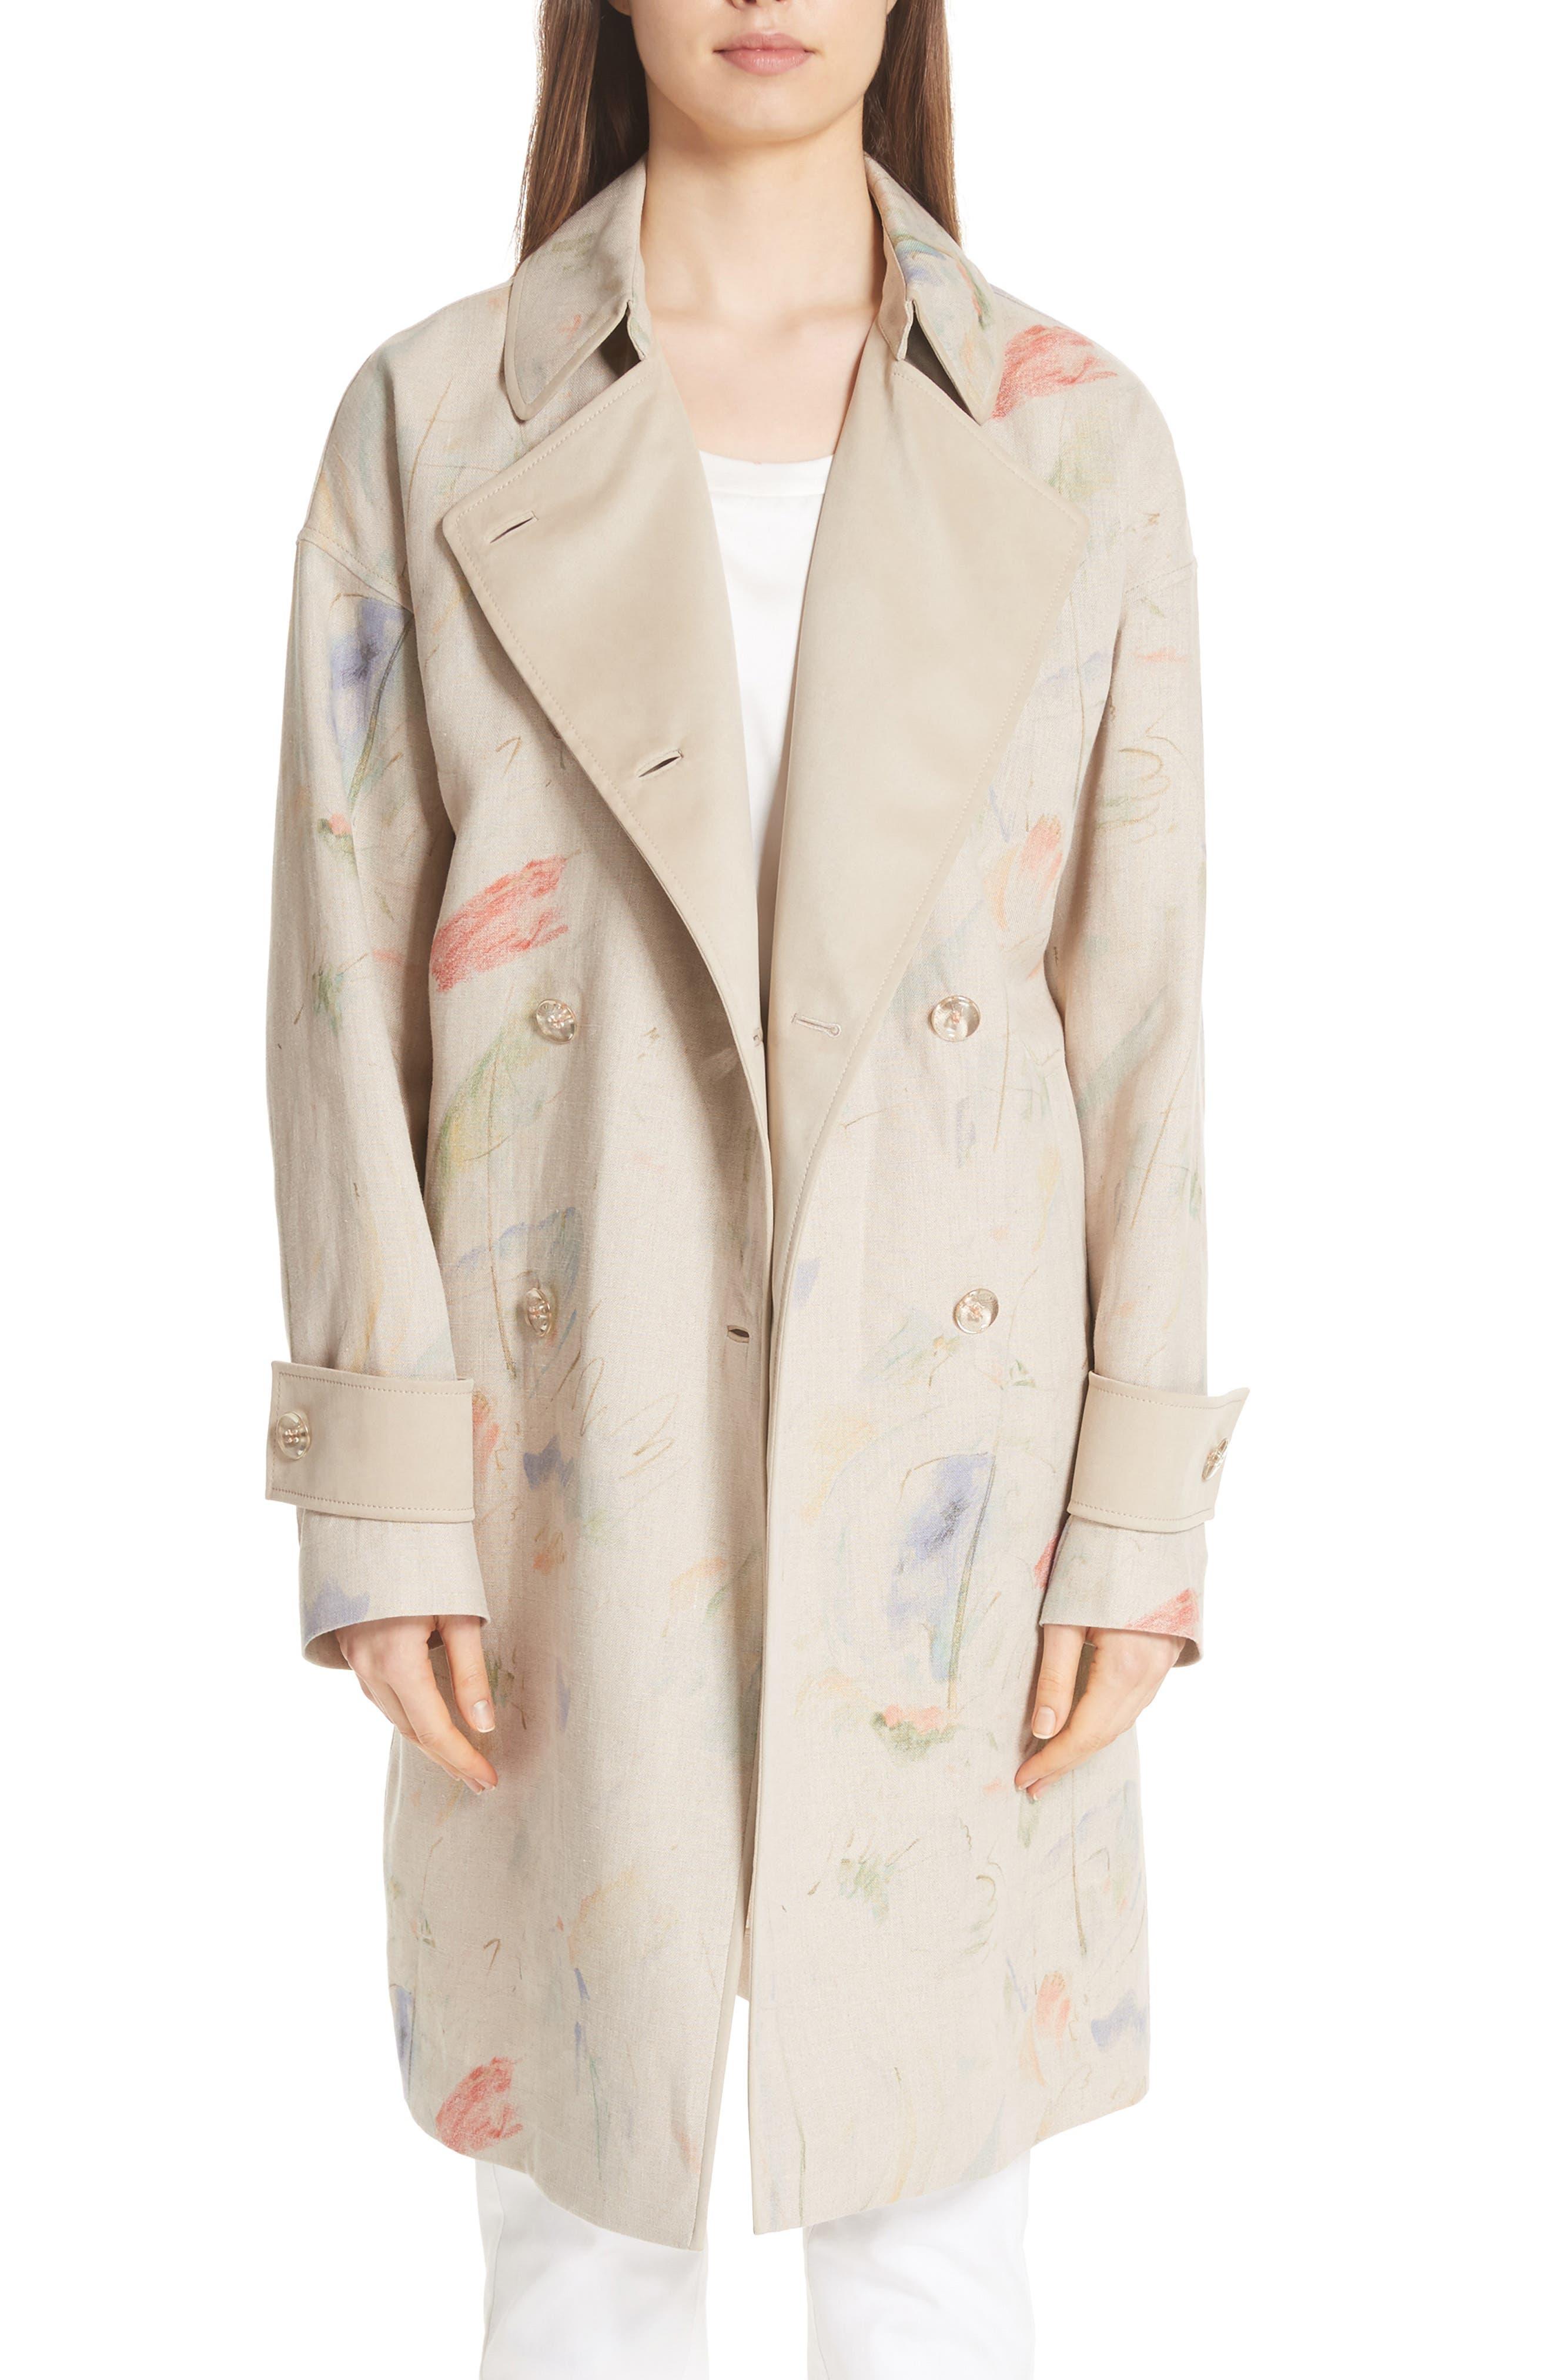 Laurita Linen Trench Coat,                             Main thumbnail 1, color,                             292